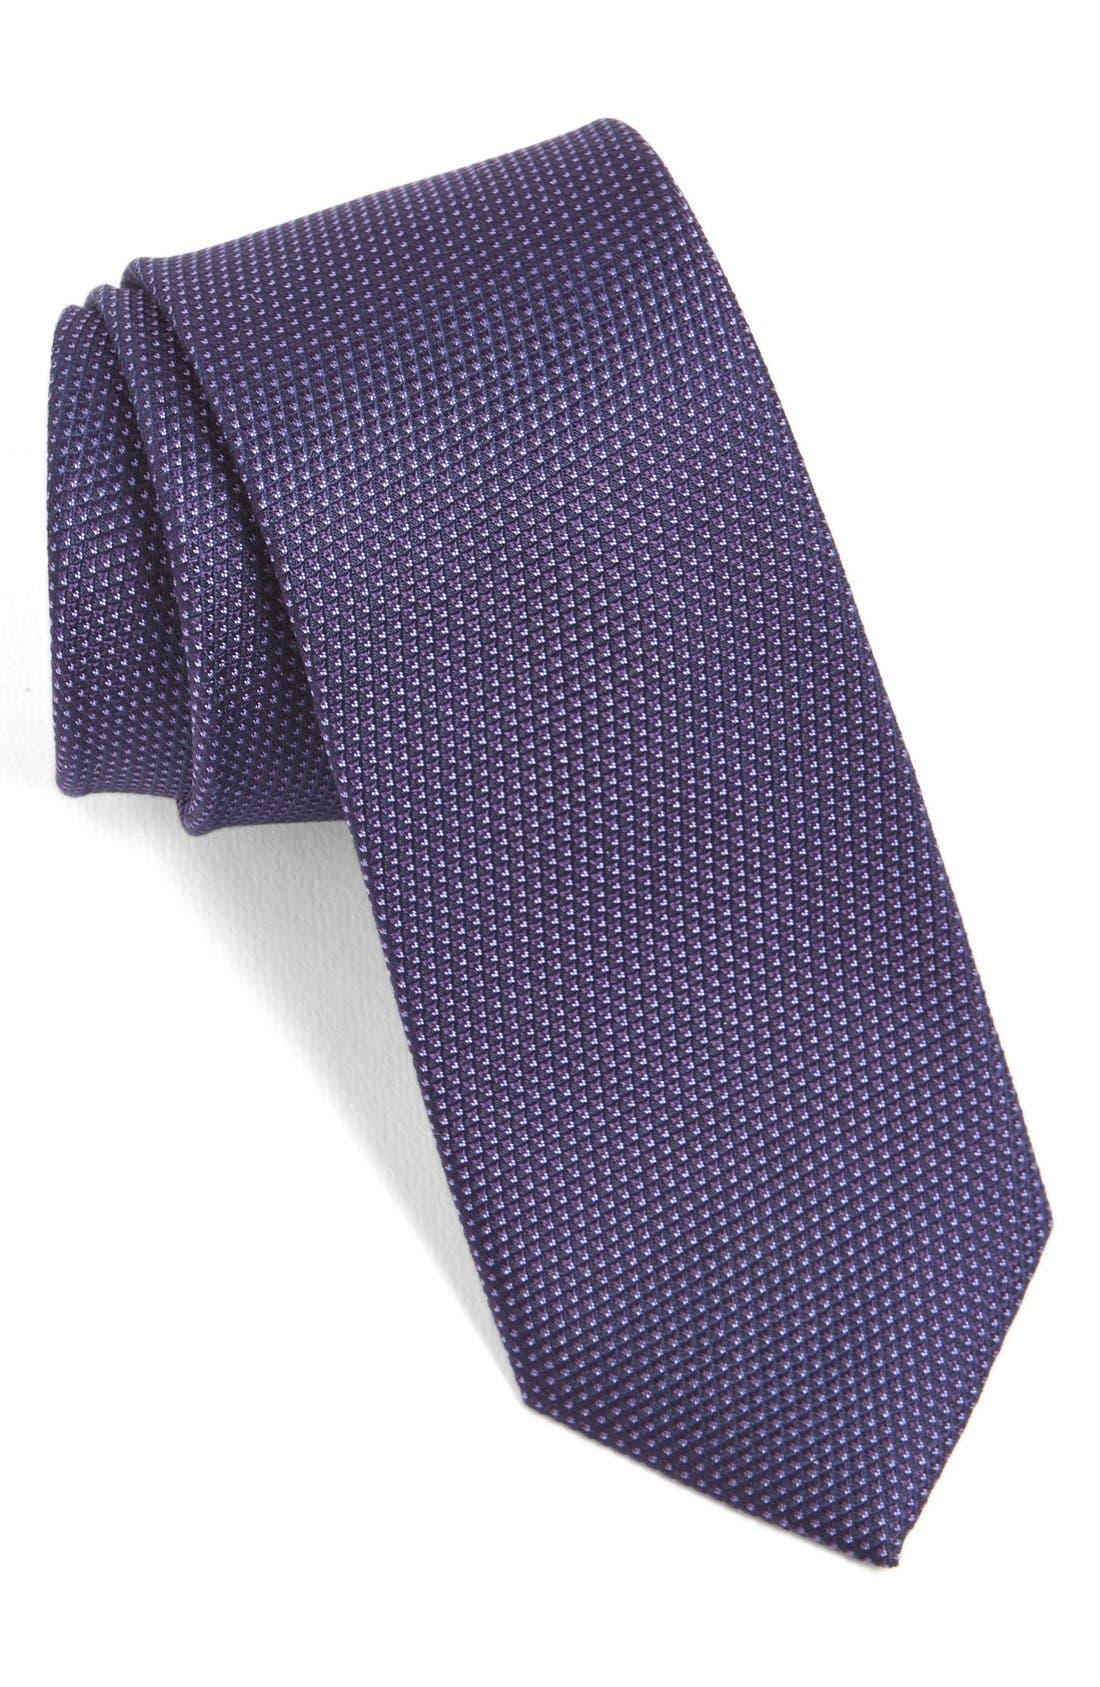 Calibrate 'Madison' Solid Silk Tie